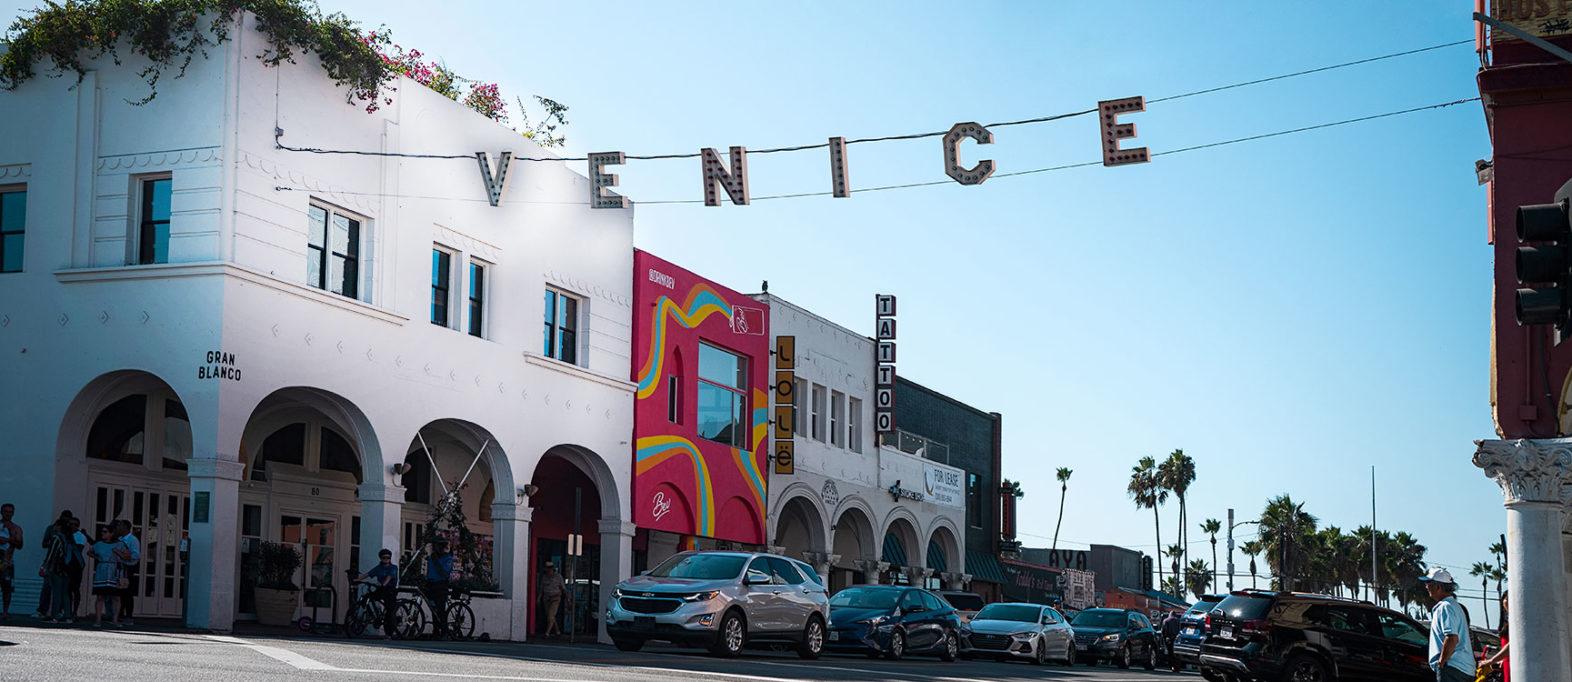 Venice Sign Los Angeles